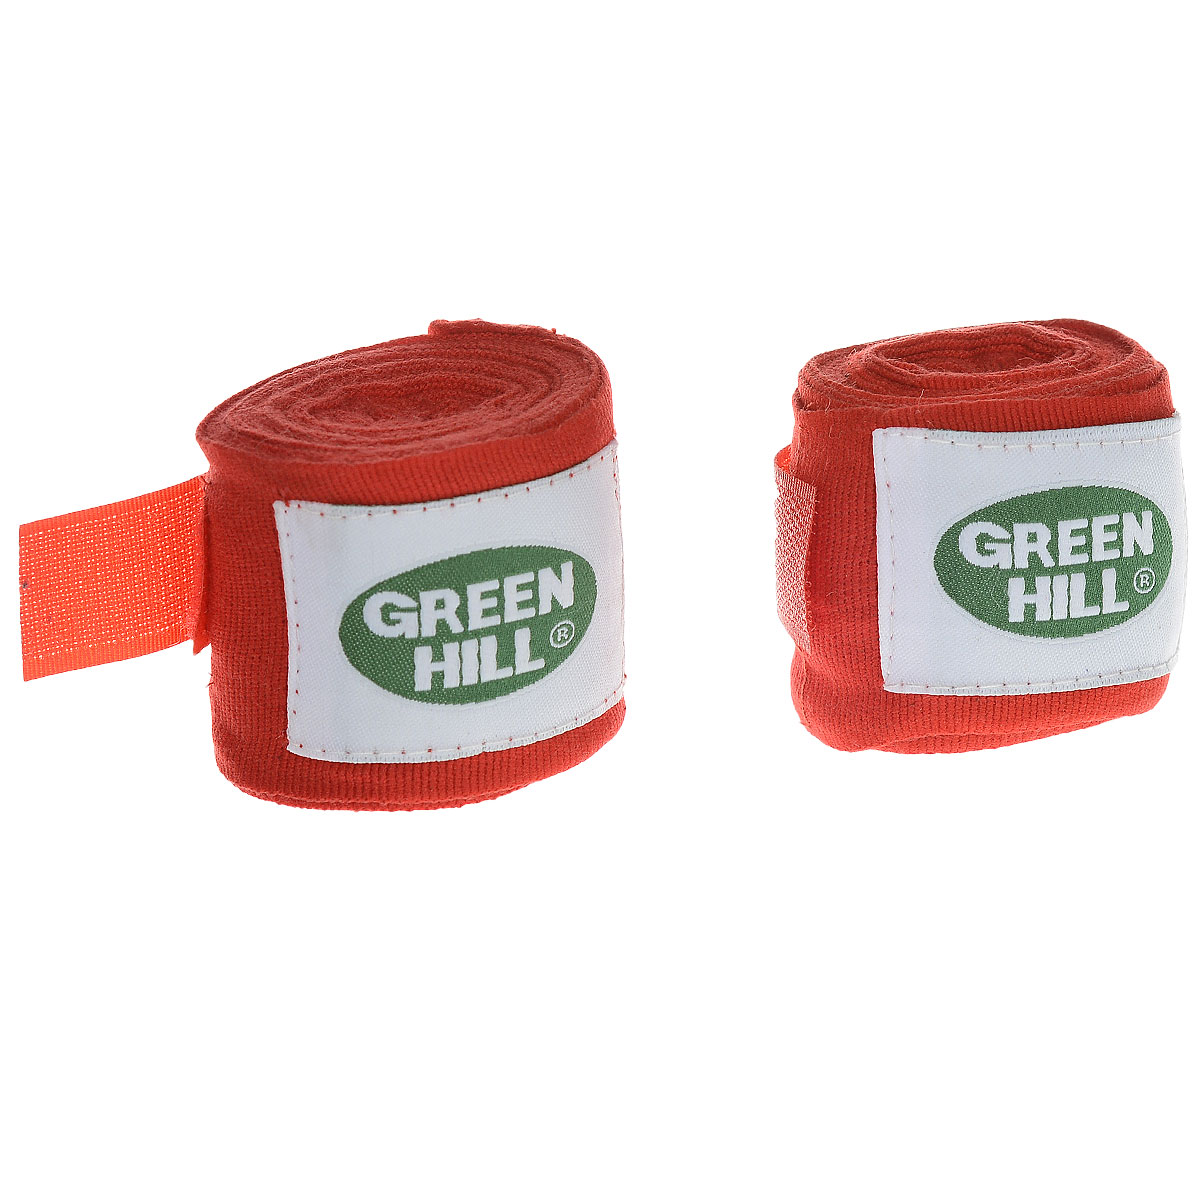 Бинты боксерские Green Hill, эластик, цвет: красный, 3,5 м, 2 шт бинты боксёрские green hill 3 5 м эластик красные bp 6232c